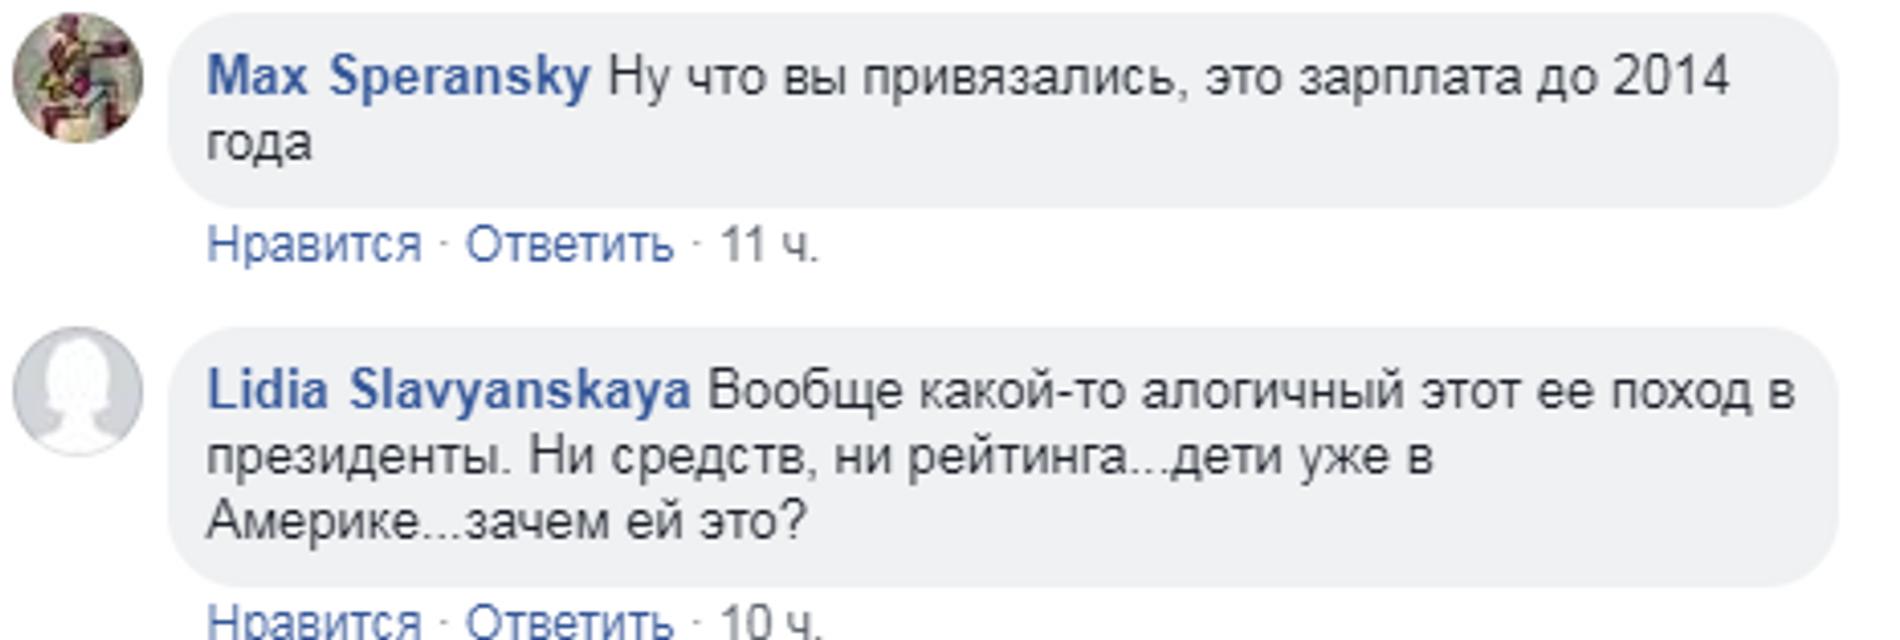 Расплатилась рублями: кандидатка в президенты спалилась не на шутку ФОТО - фото 177073